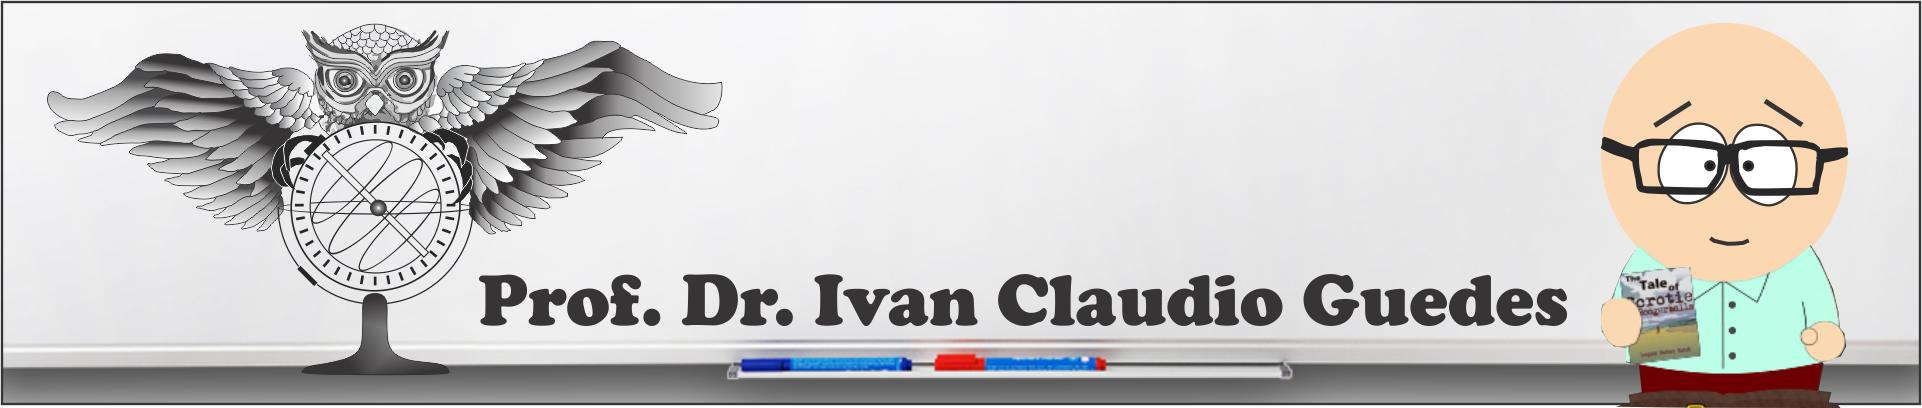 Prof. Dr. Ivan Claudio Guedes